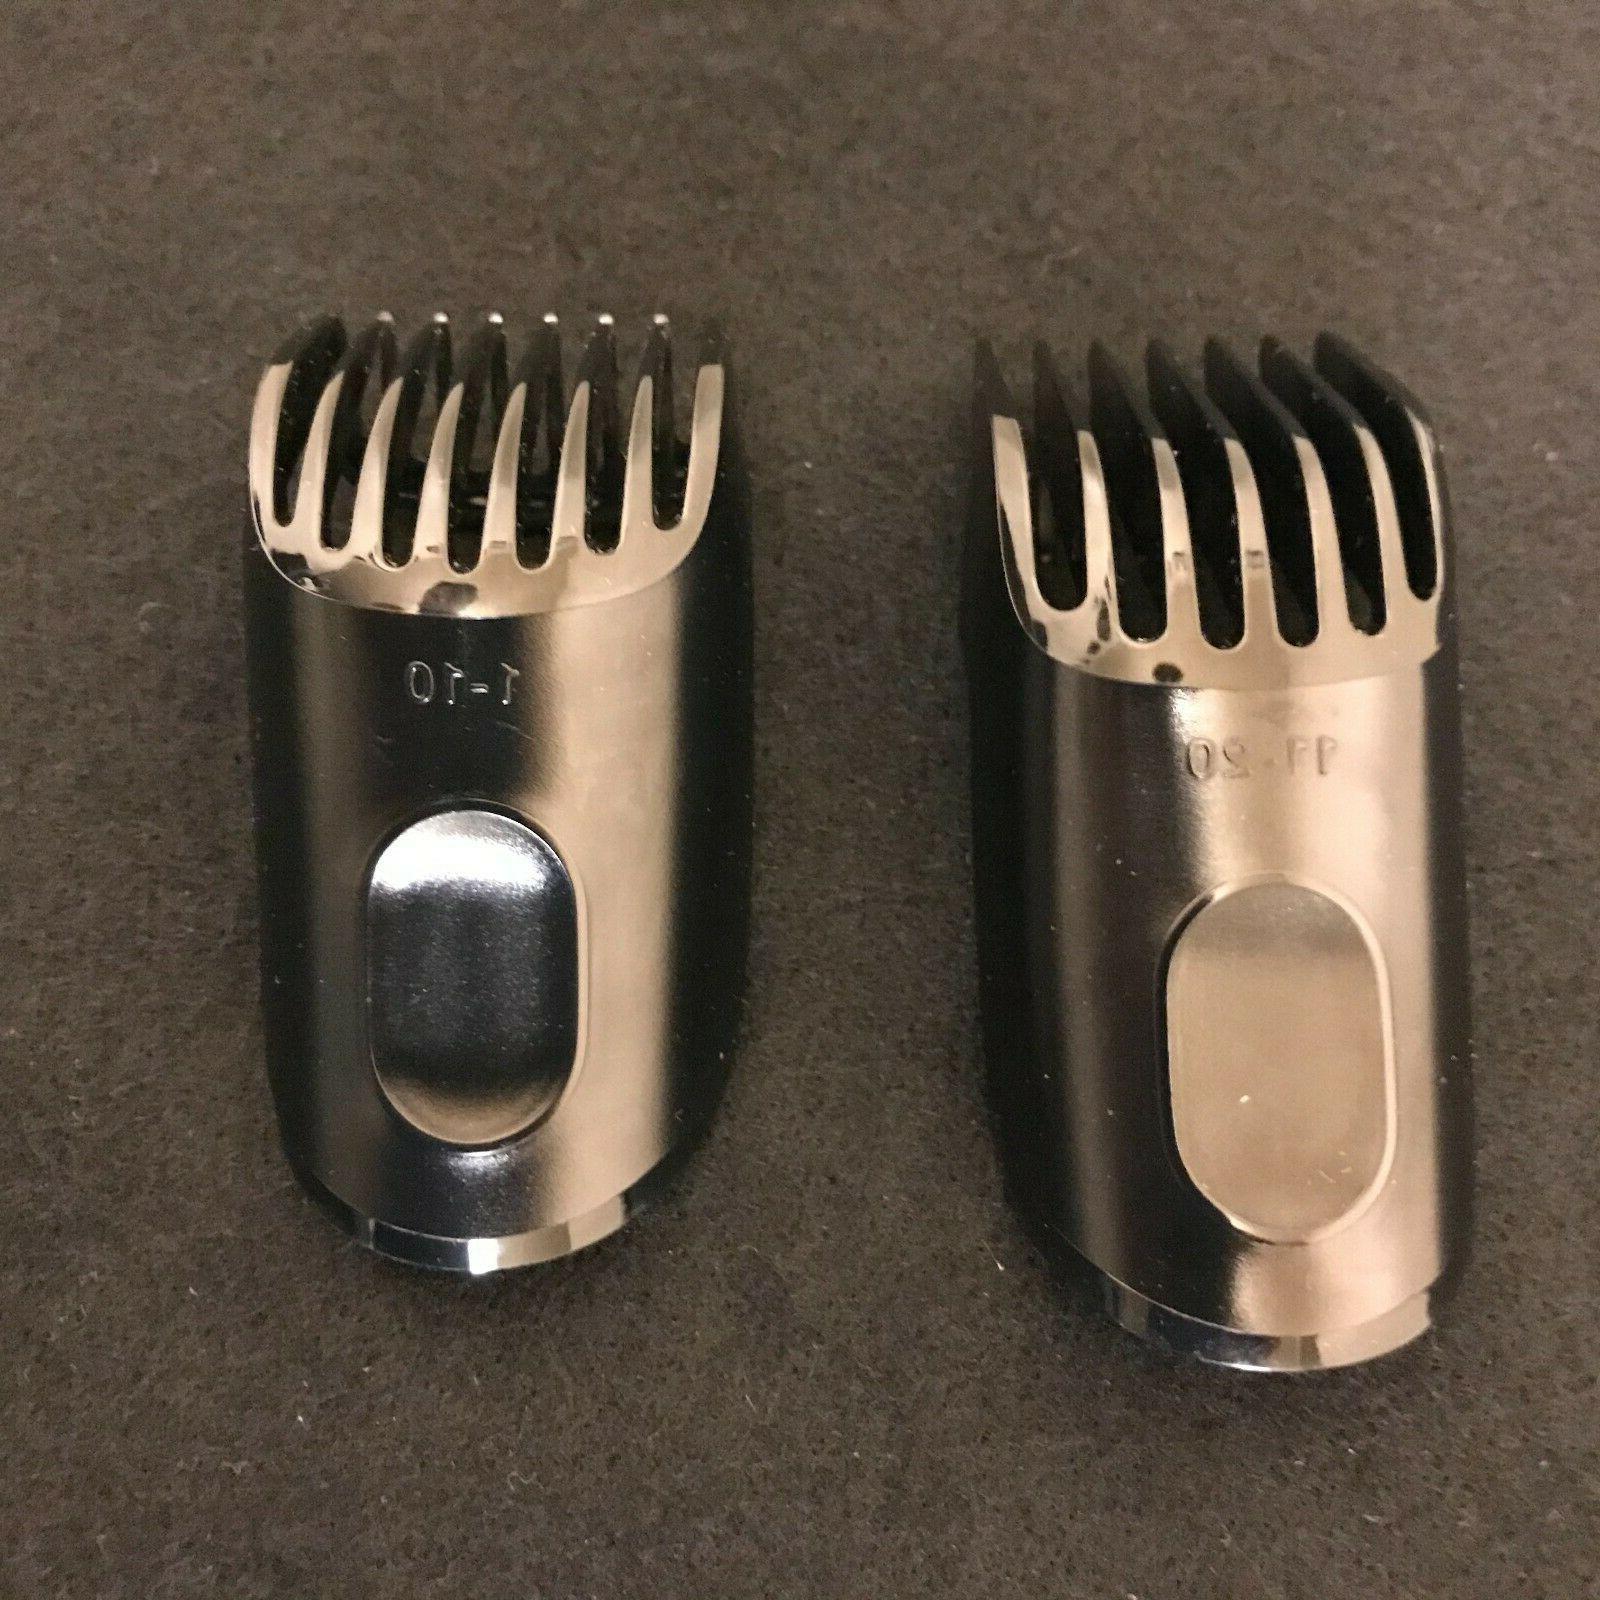 Braun Cordless Trimmer Hair Clipper Adjustable Dial